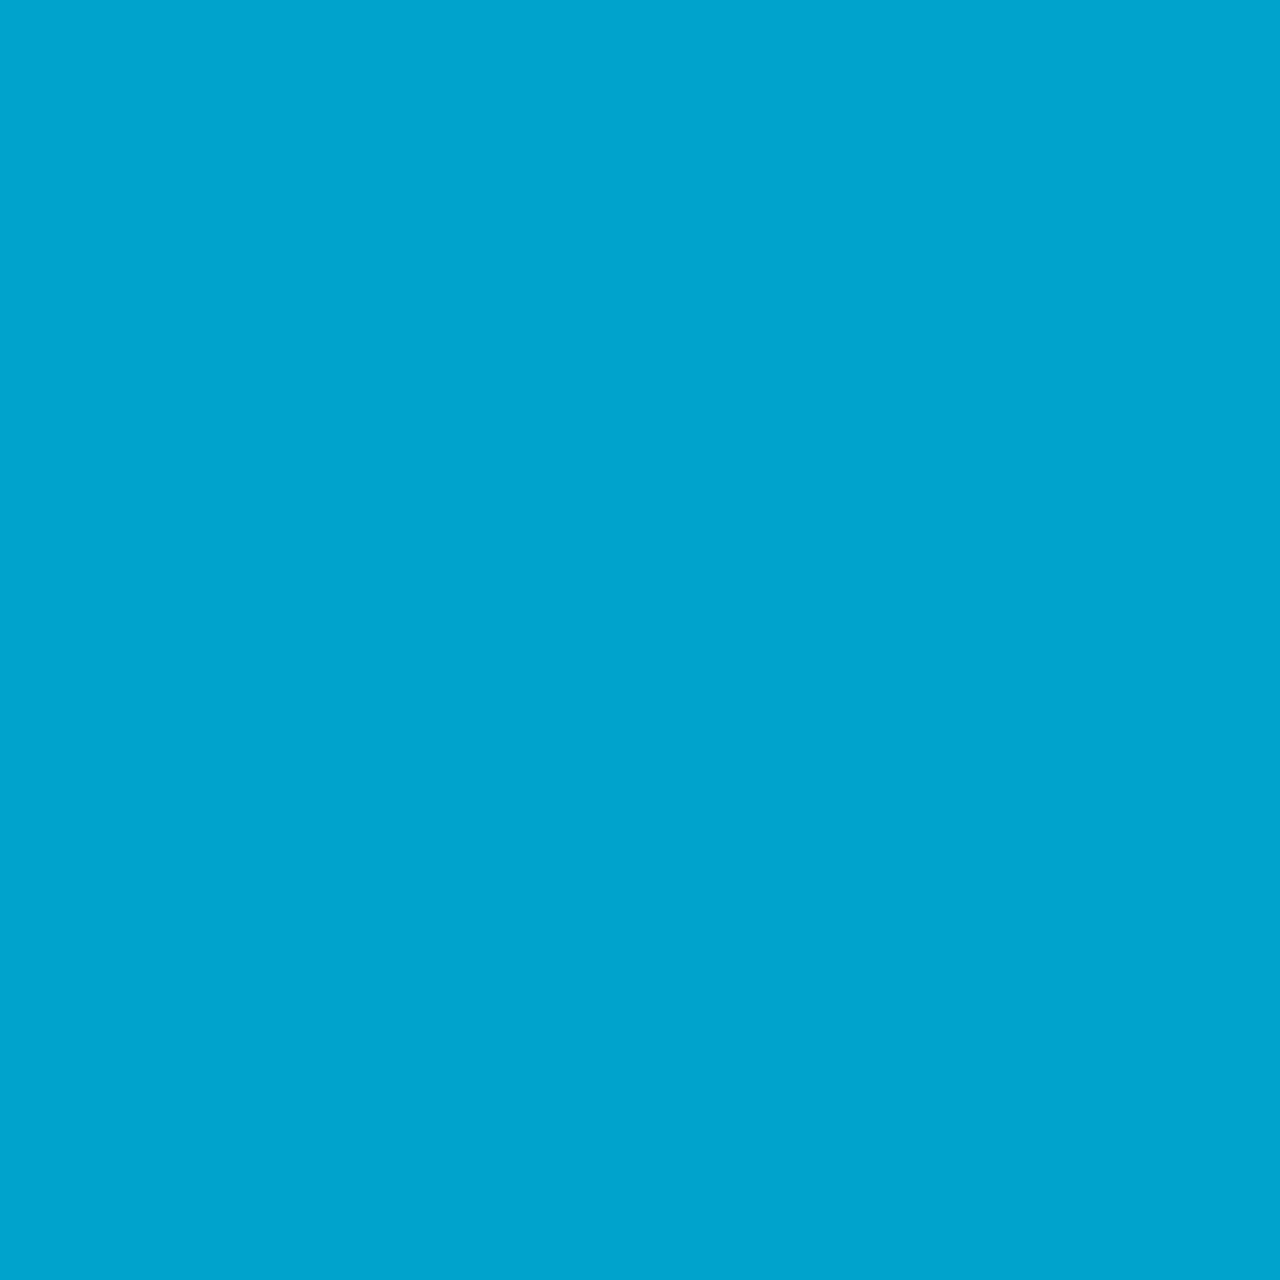 "#0070 Rosco Gels Roscolux Nile Blue, 20x24"""